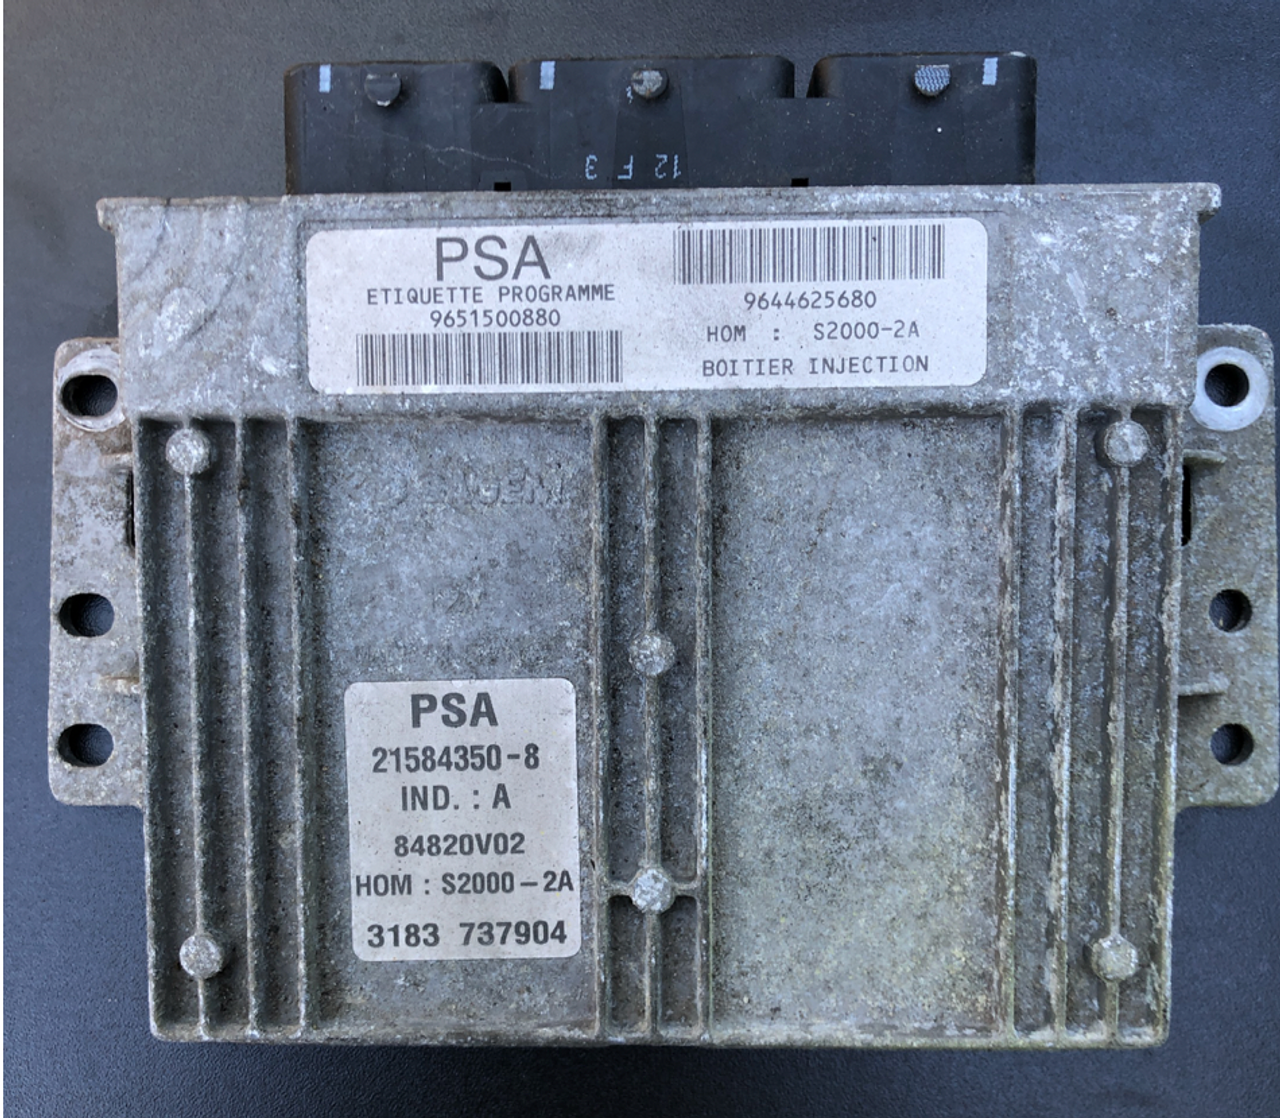 Sagem Engine ECU, PSA, Peugeot/Citroen, S2000-2A, 9651500880, 9644625680, 21584350-8